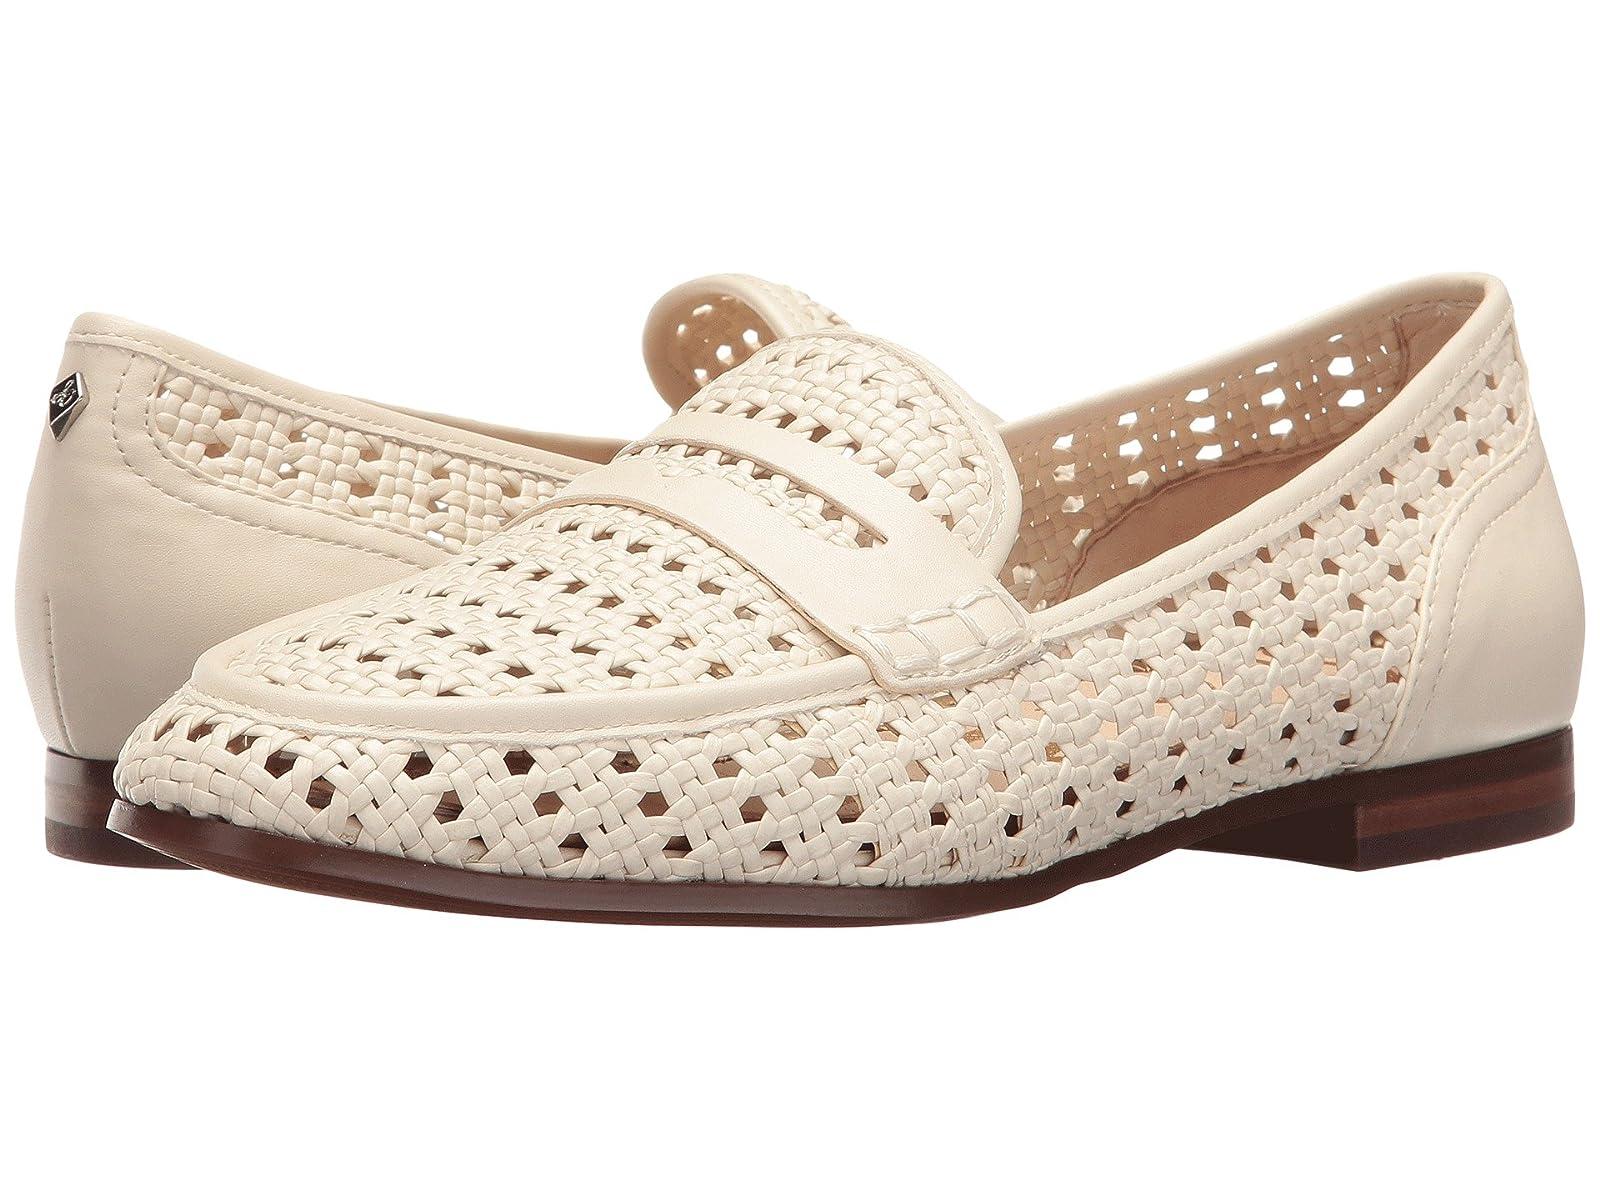 Sam Edelman LeoraCheap and distinctive eye-catching shoes